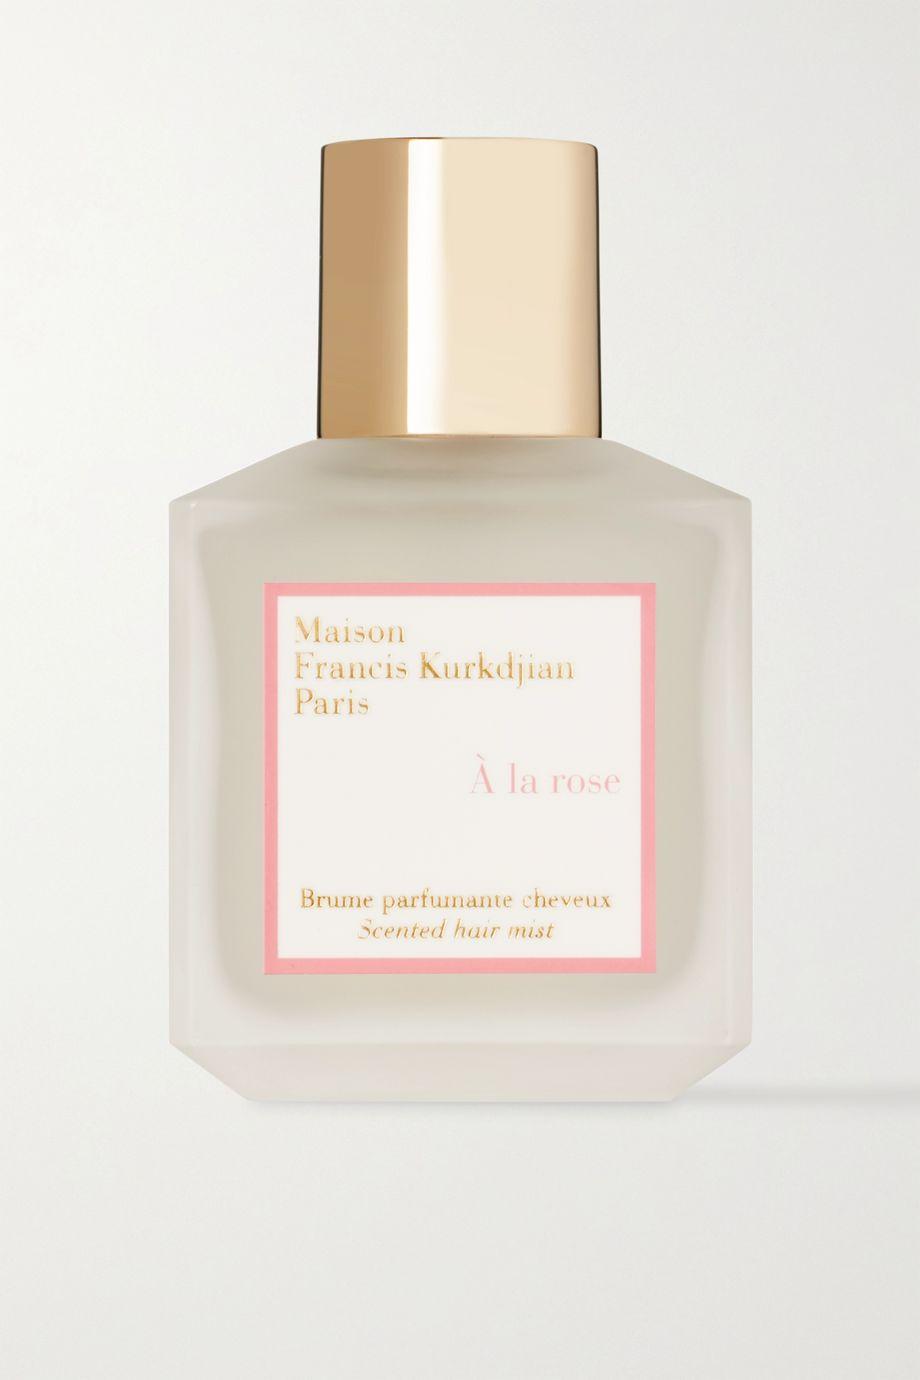 Maison Francis Kurkdjian À La Rose Scented Hair Mist, 70ml